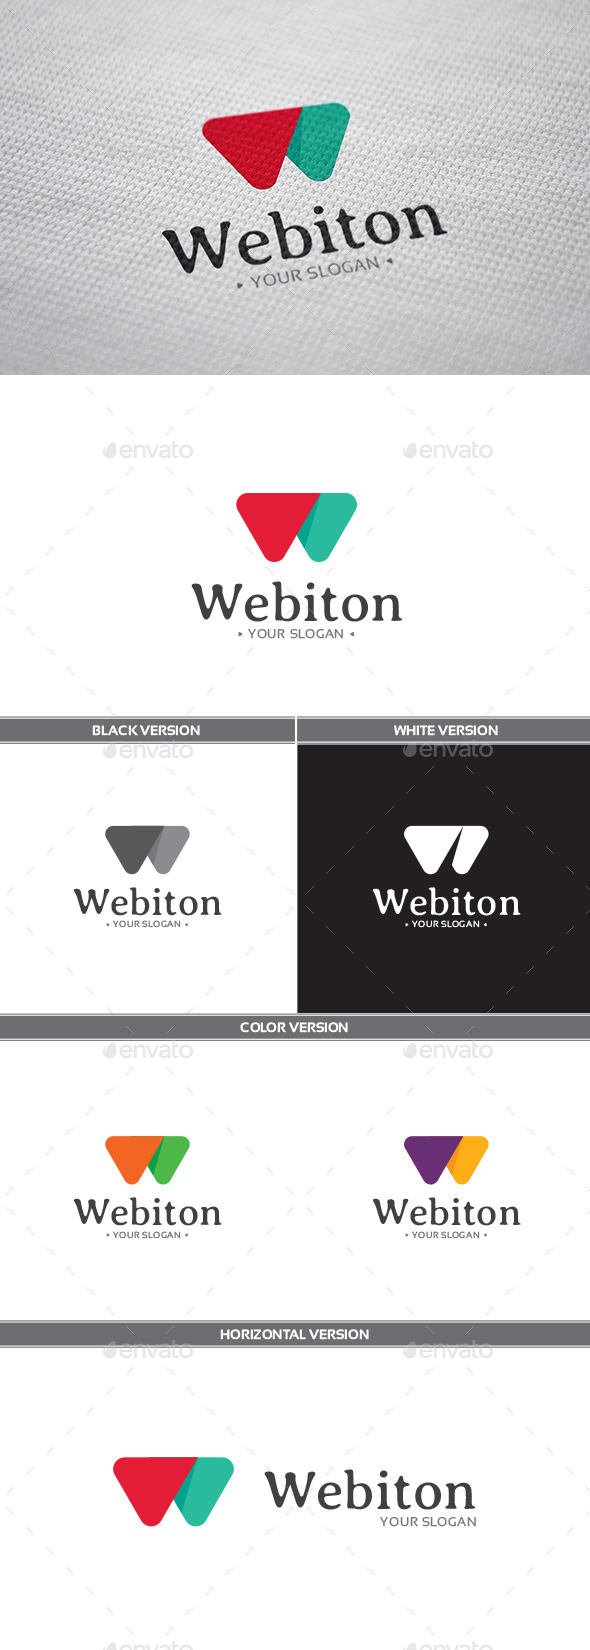 GraphicRiver Webiton Logo 11030556